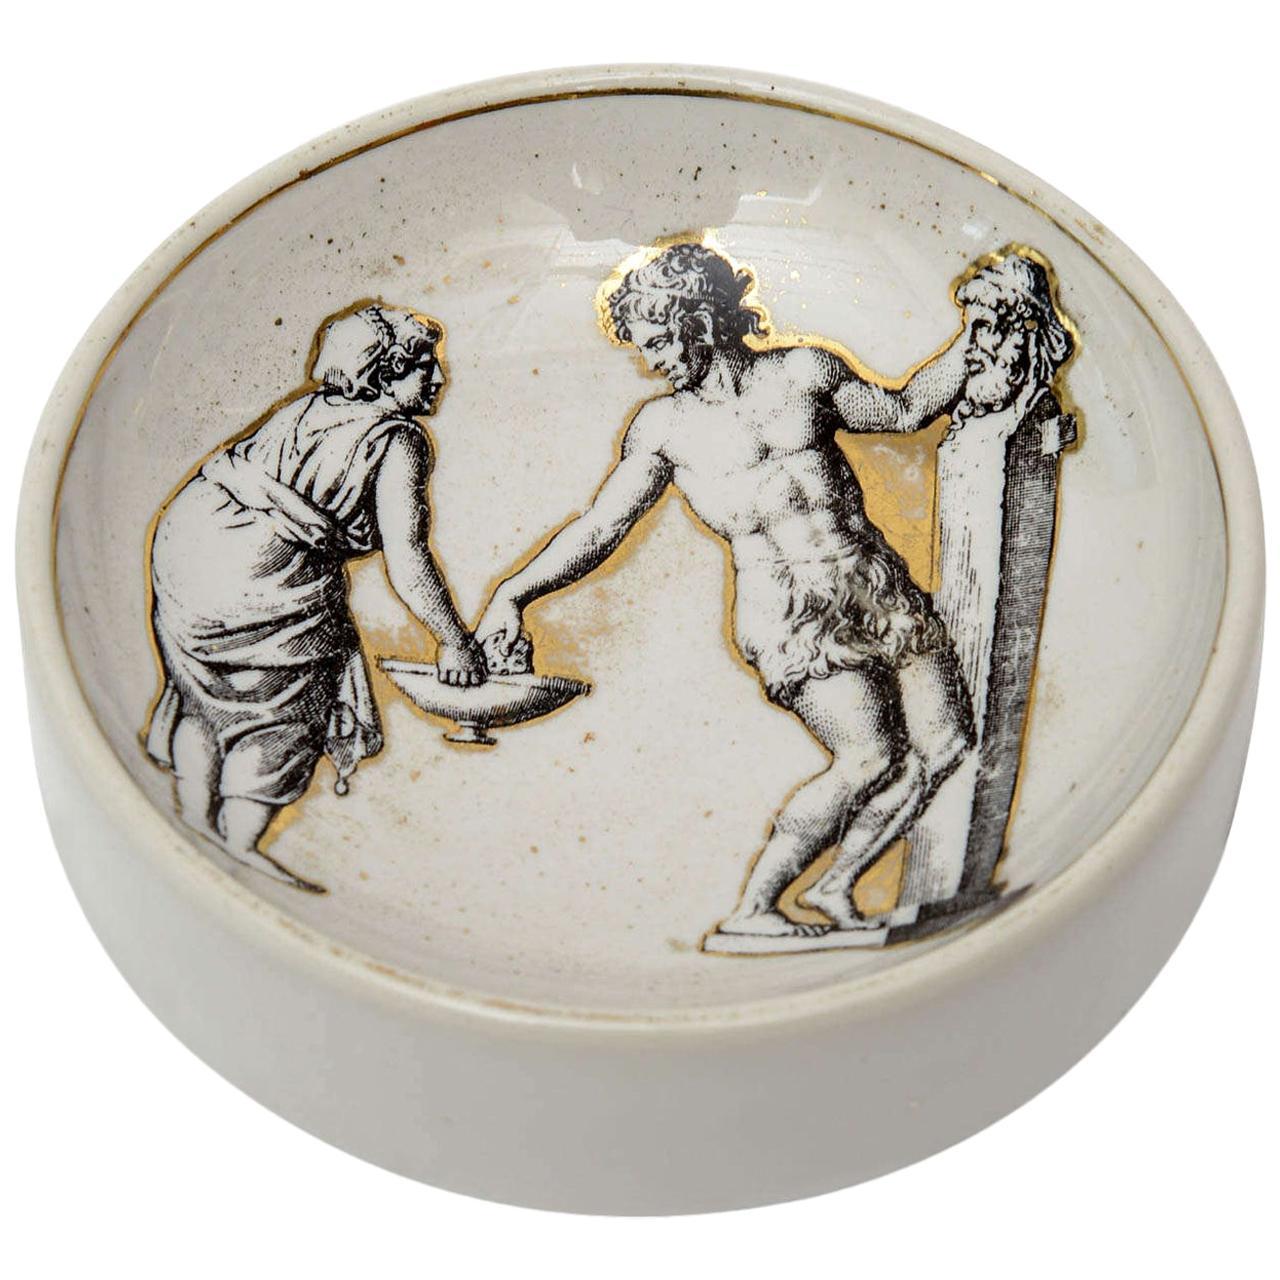 Piero Fornasetti Porcelain Bowl Mid-Century Modern